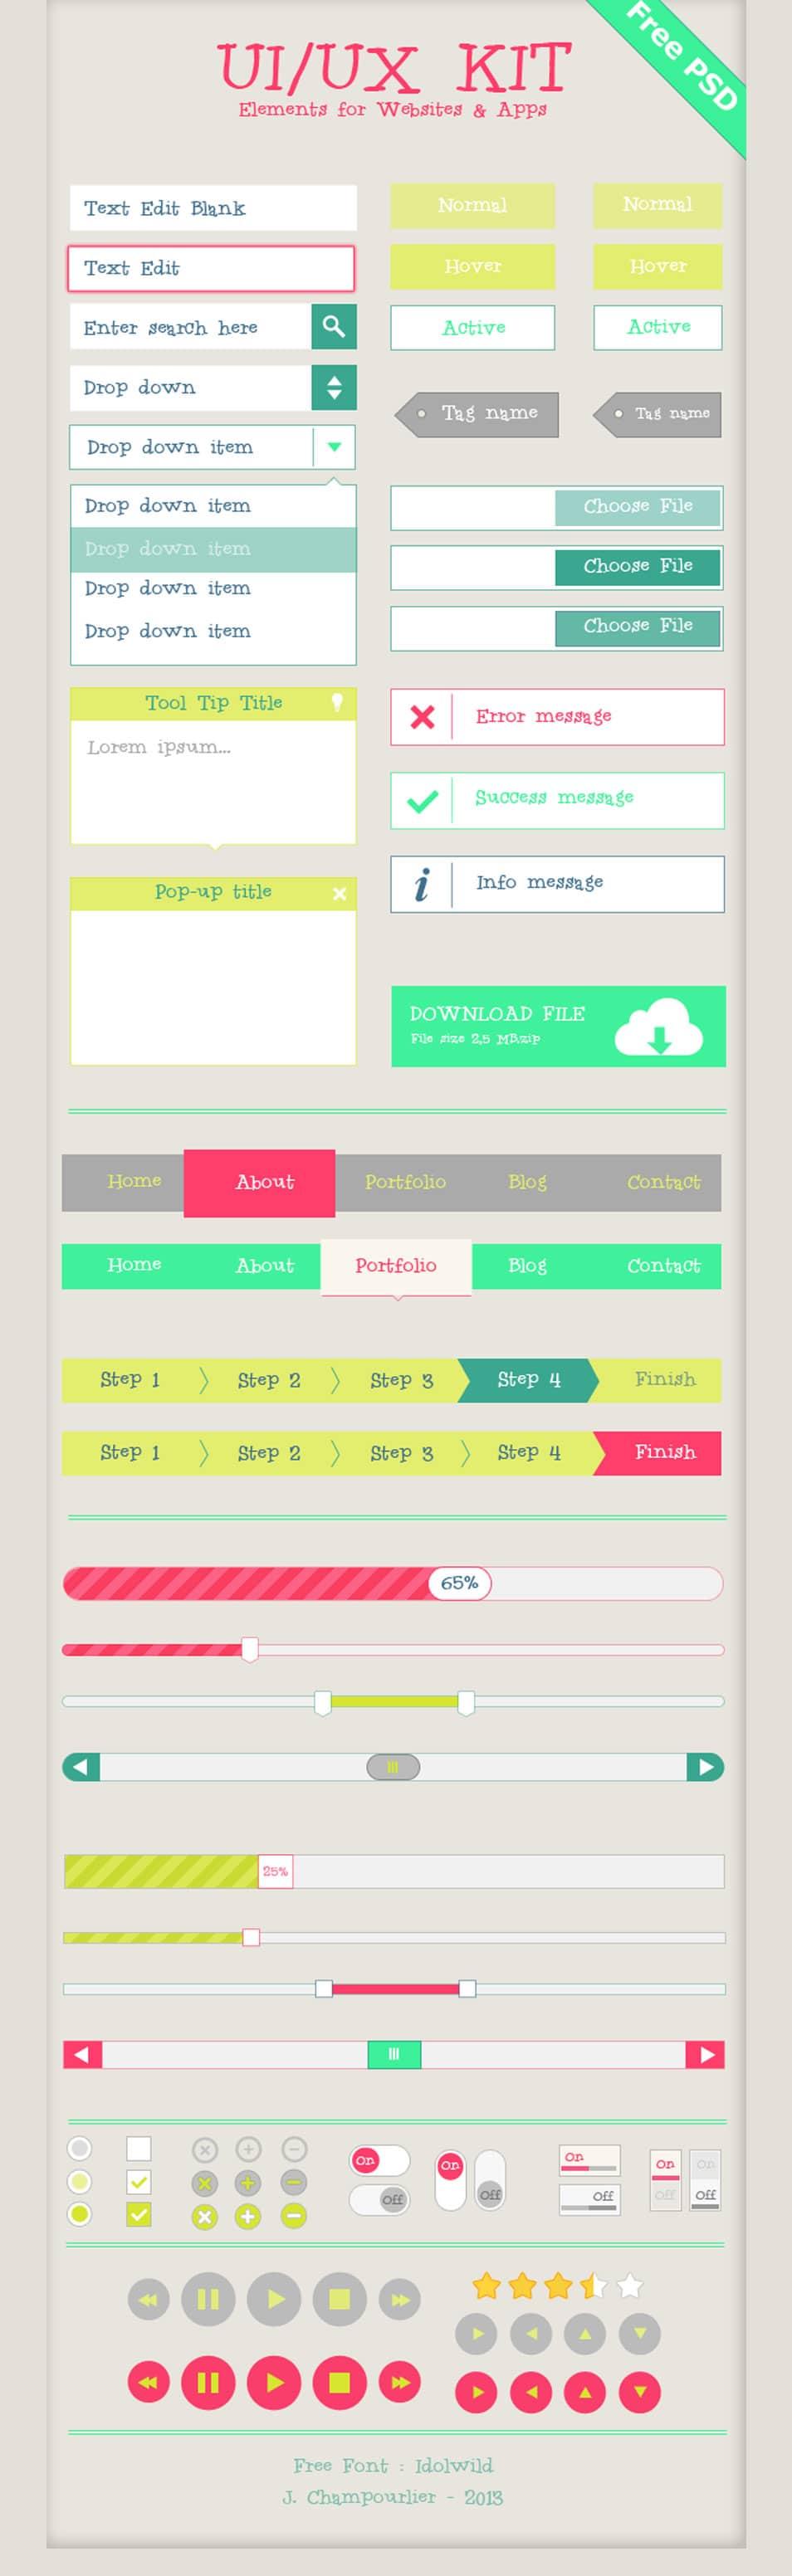 UIUX Flat Design Kit